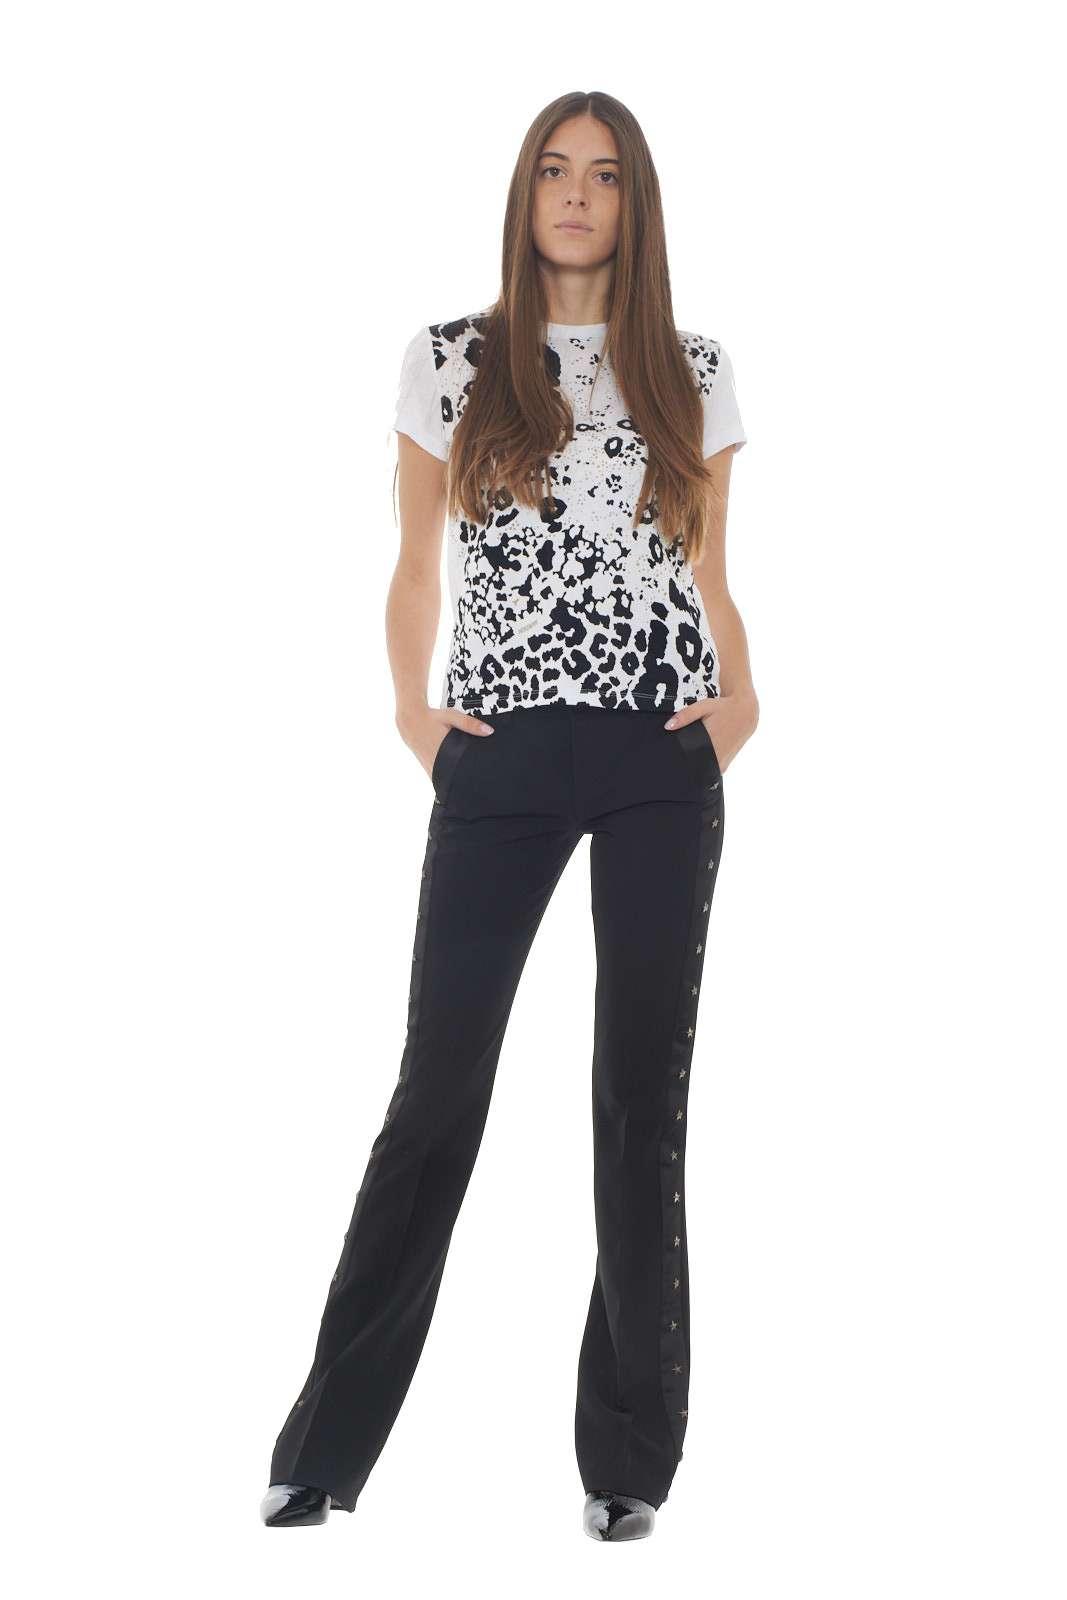 https://www.parmax.com/media/catalog/product/a/i/AI-outlet_parmax-t-shirt-donna-Patrizia-Pepe-2M3819-D.jpg